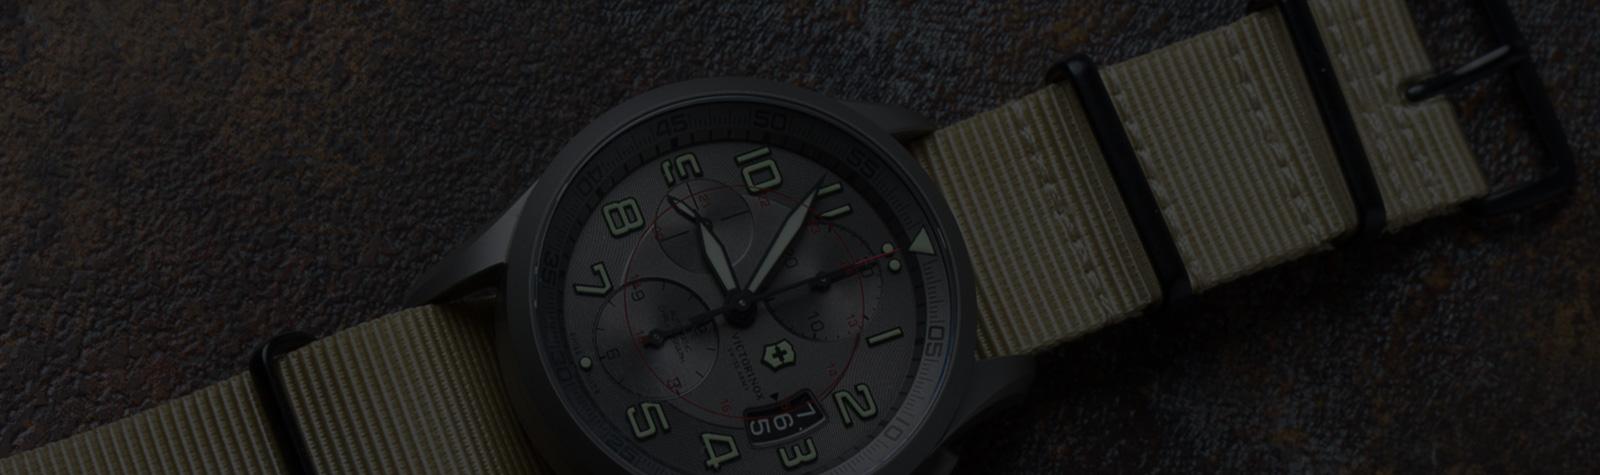 STRAP SWAP: Victorinox Swiss Army Airboss Titanium Chronograph Gets a Crown & Buckle